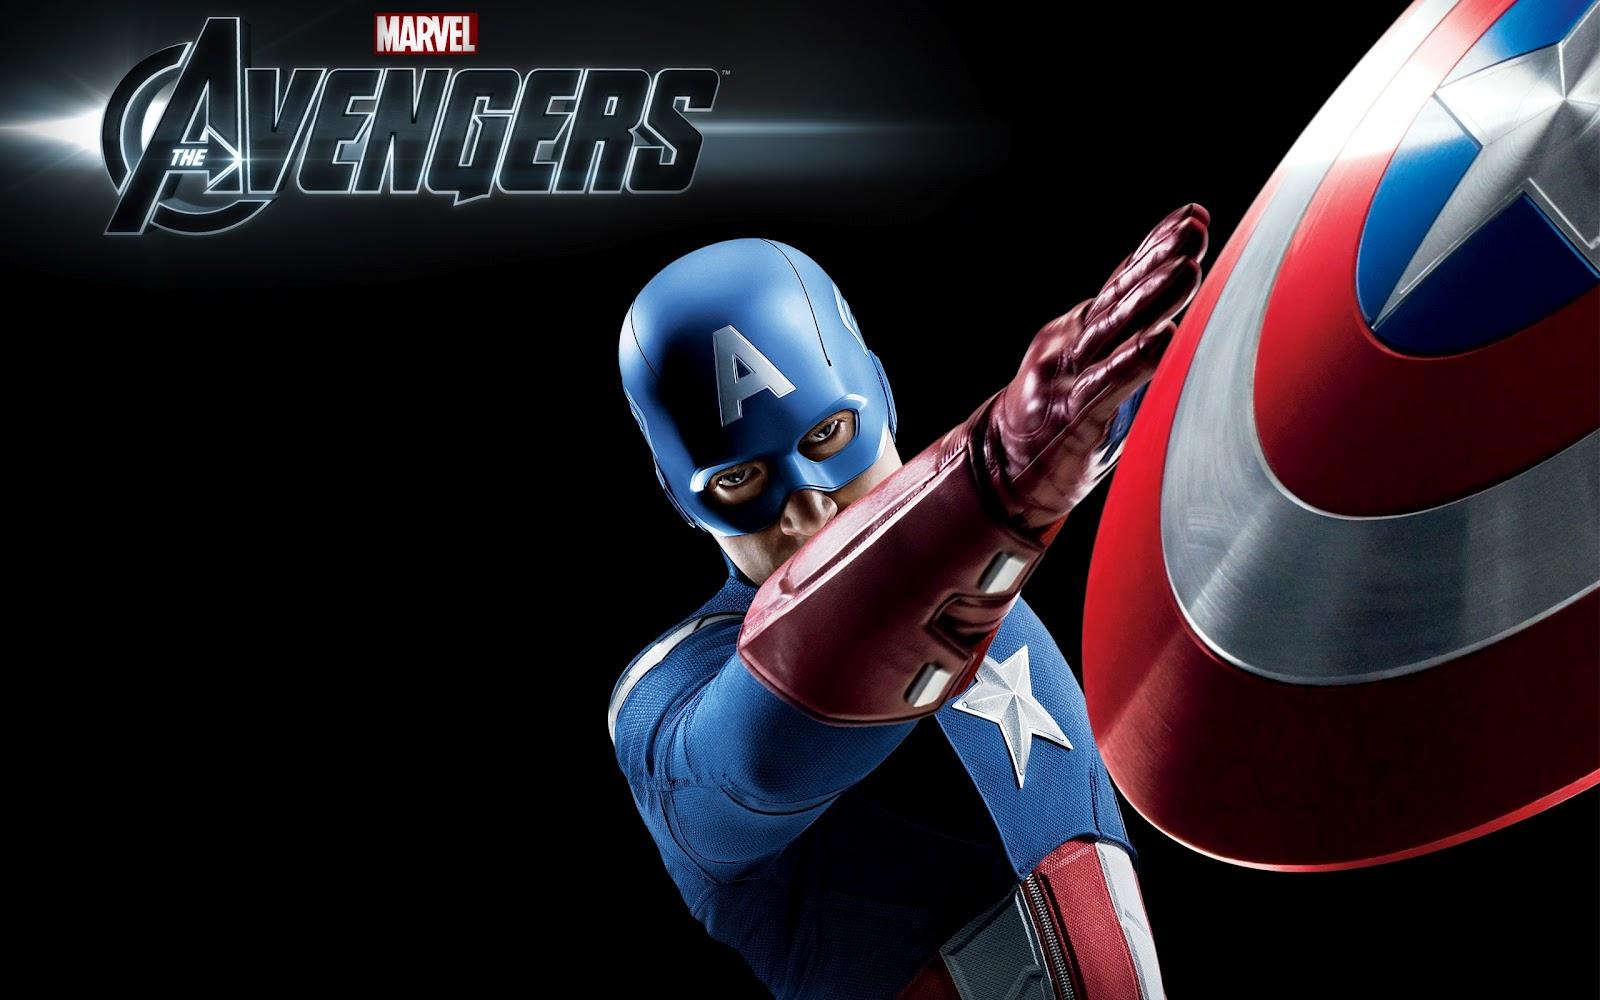 http://4.bp.blogspot.com/-Q494B4n2Lvs/T5aqeoaDcgI/AAAAAAAABsM/wlTsyrKR30w/s1600/the-avengers-captain-america-steve-rogers-avengers-full-hd-wallpaper.jpg